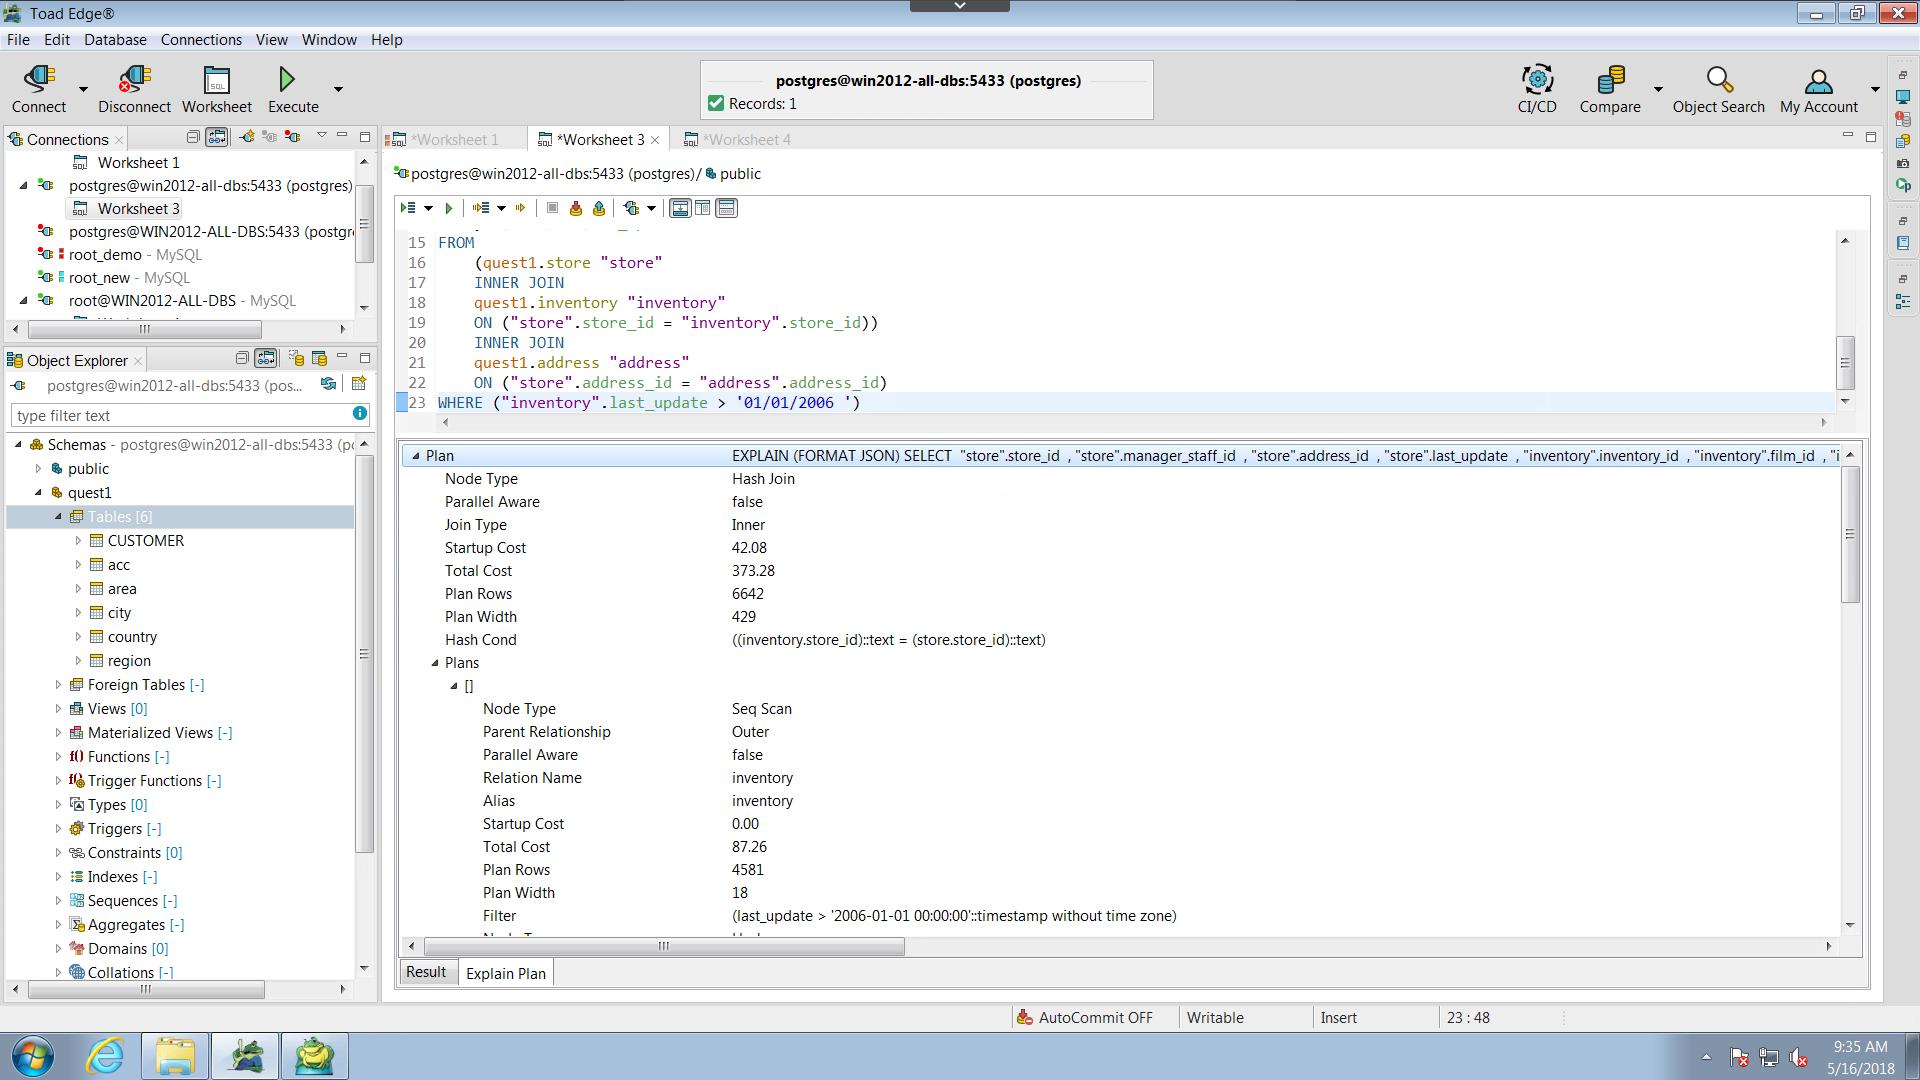 Postgres database admin | Toad Edge for Postgres